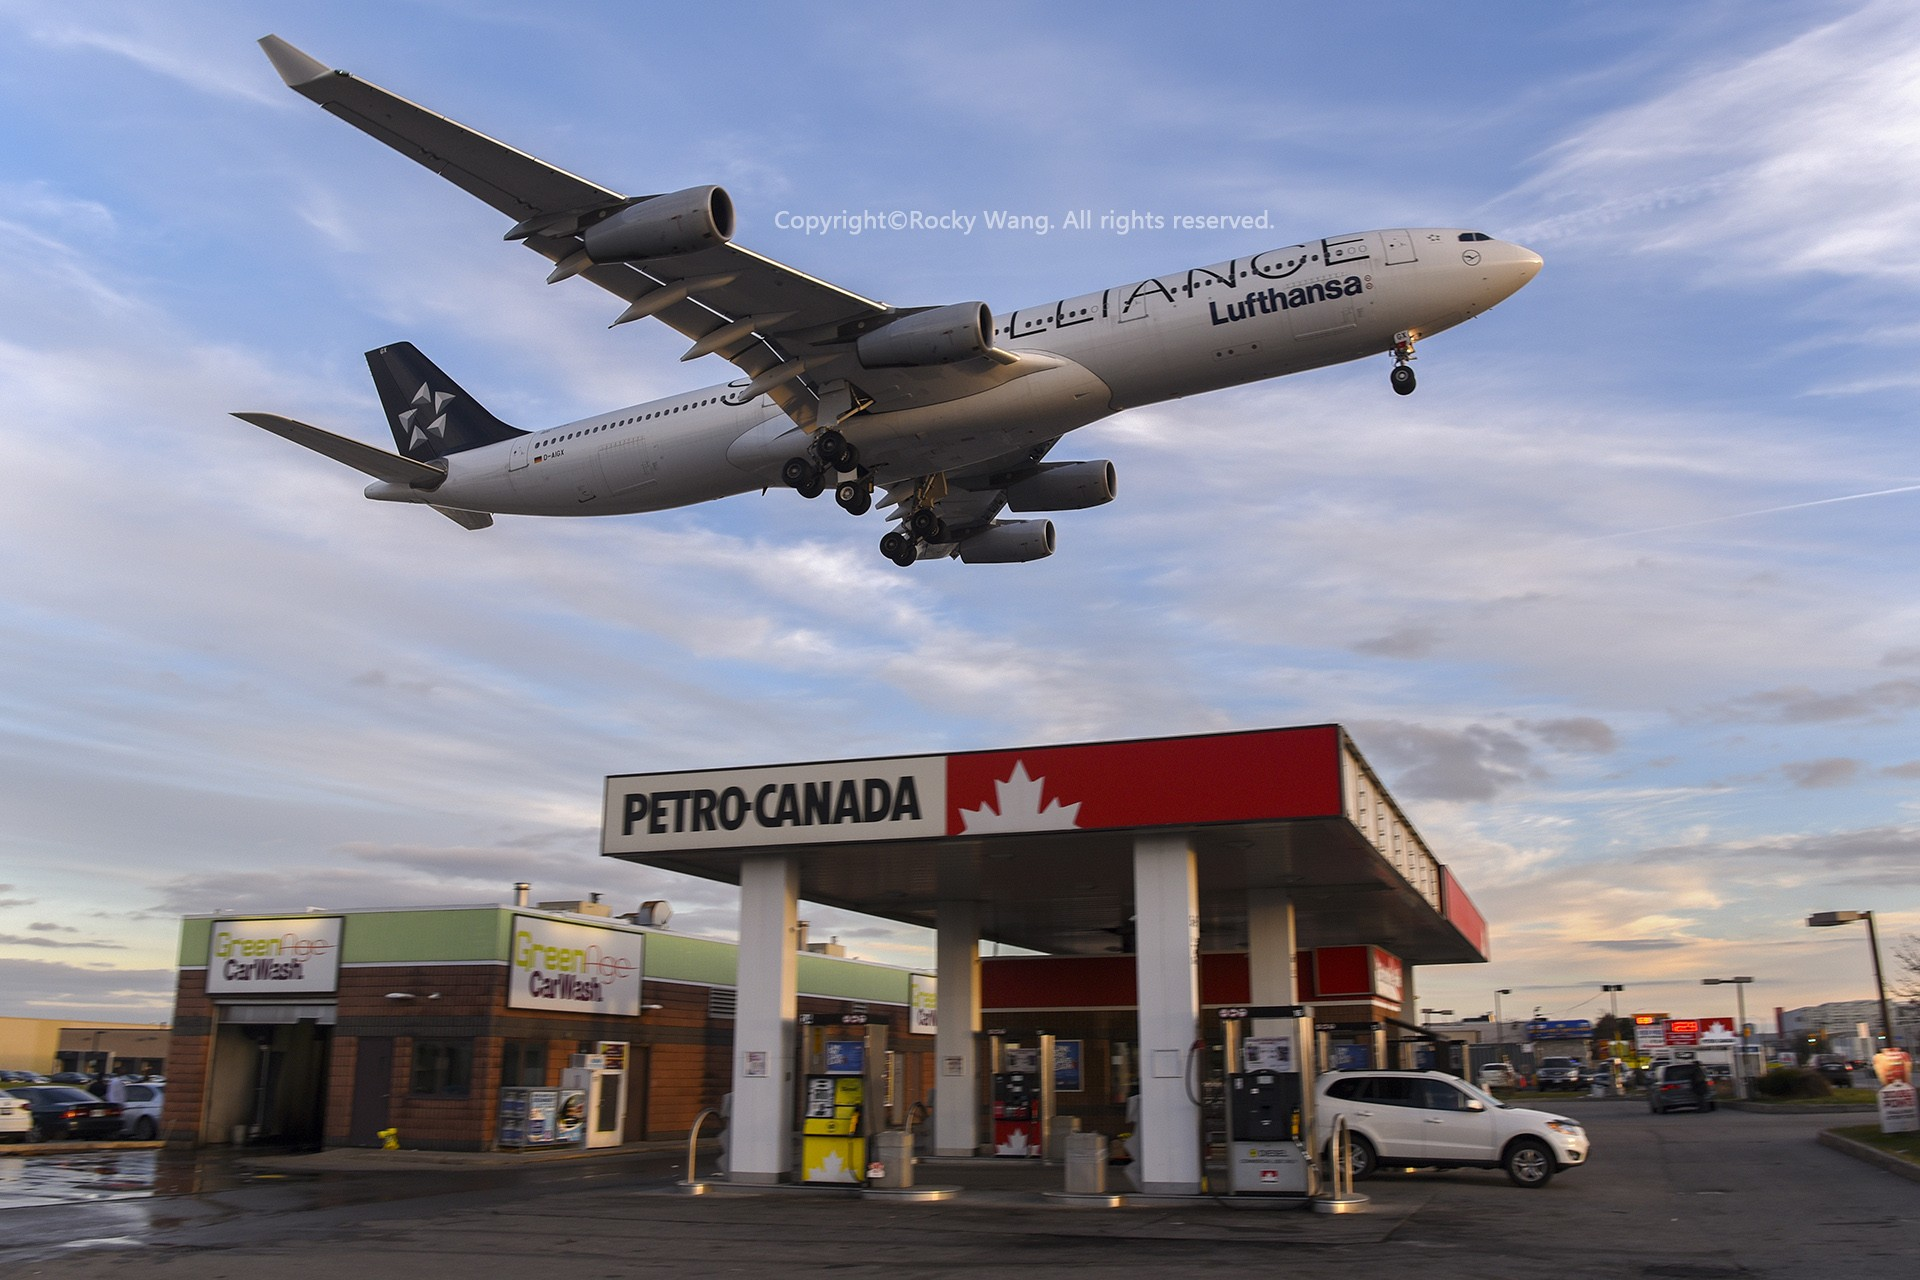 Re:[原创]CYYZ 30图 AIRBUS A340-313X D-AIGX Toronto Lester B. Pearson Int'l Airport